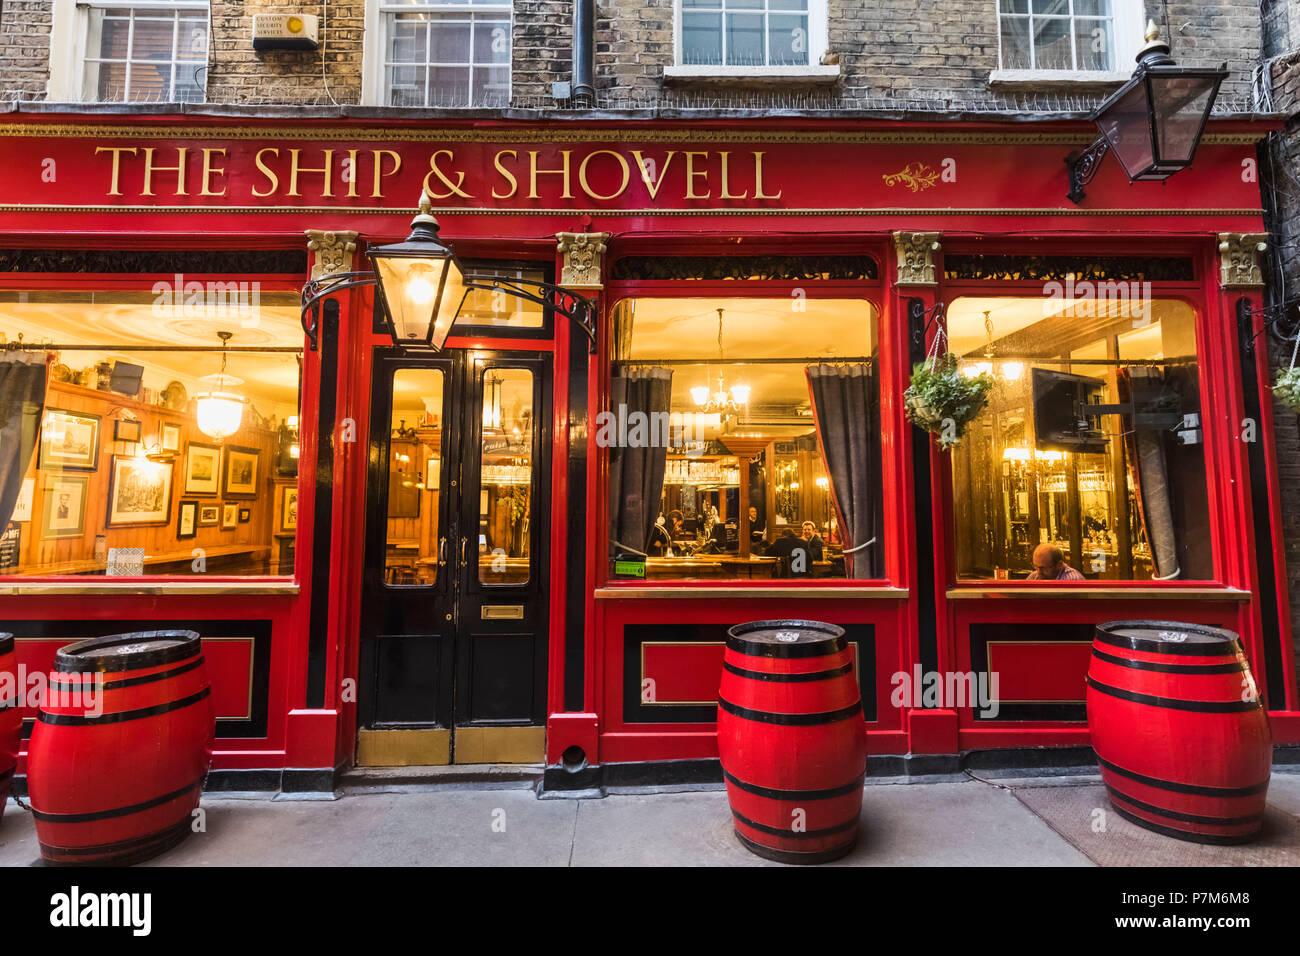 England, London, Embankment, The Ship and Shovell Pub - Stock Image